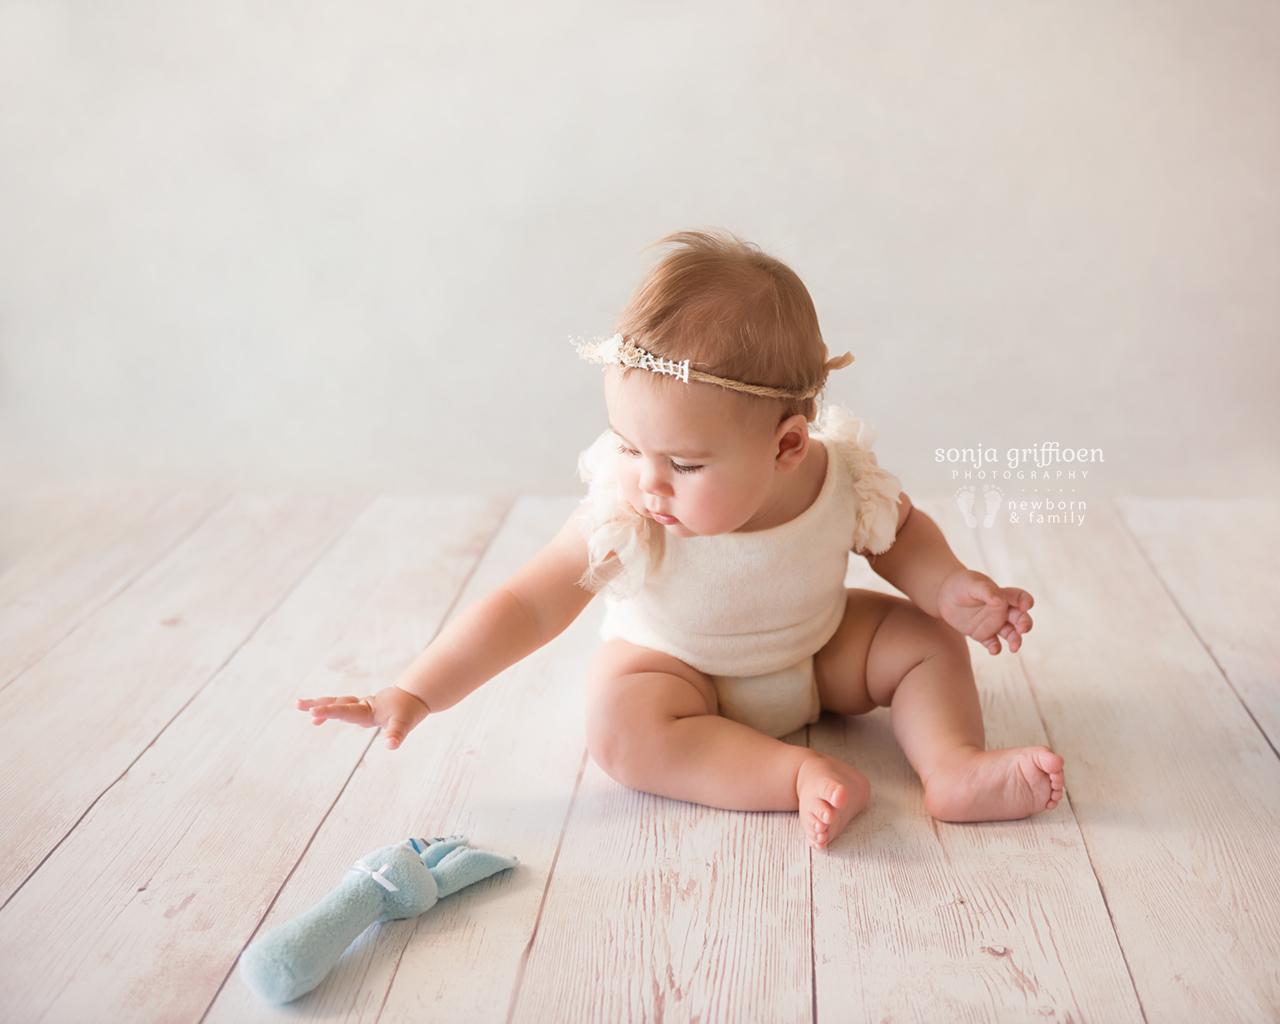 Thalia-Milestone-Brisbane-Newborn-Photographer-Sonja-Griffioen-05.jpg